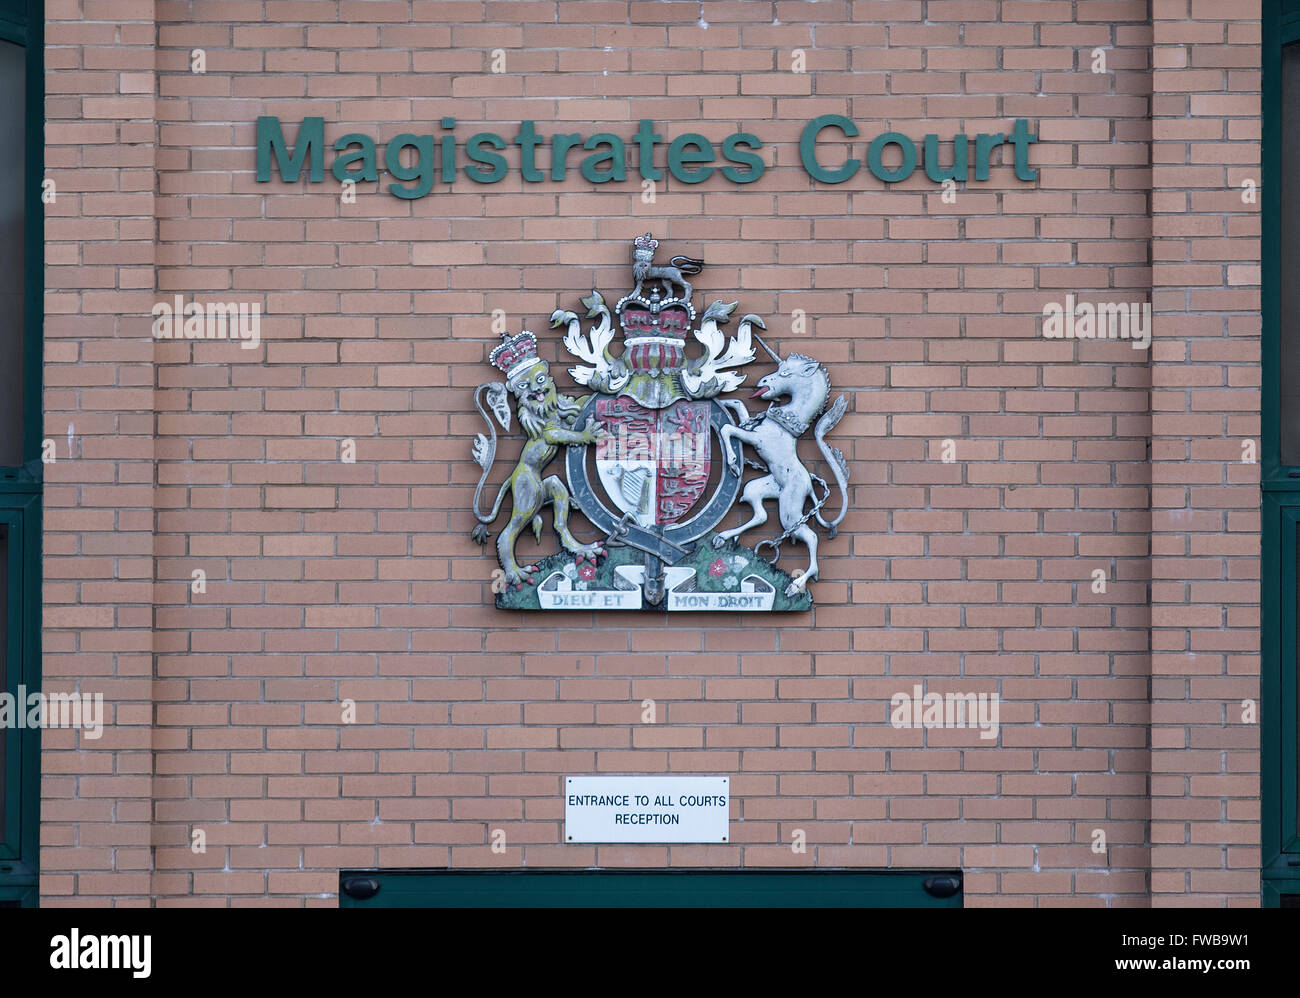 Swindon Magistrates court in Princess Street Swindon, Wiltshire, UK - Stock Image